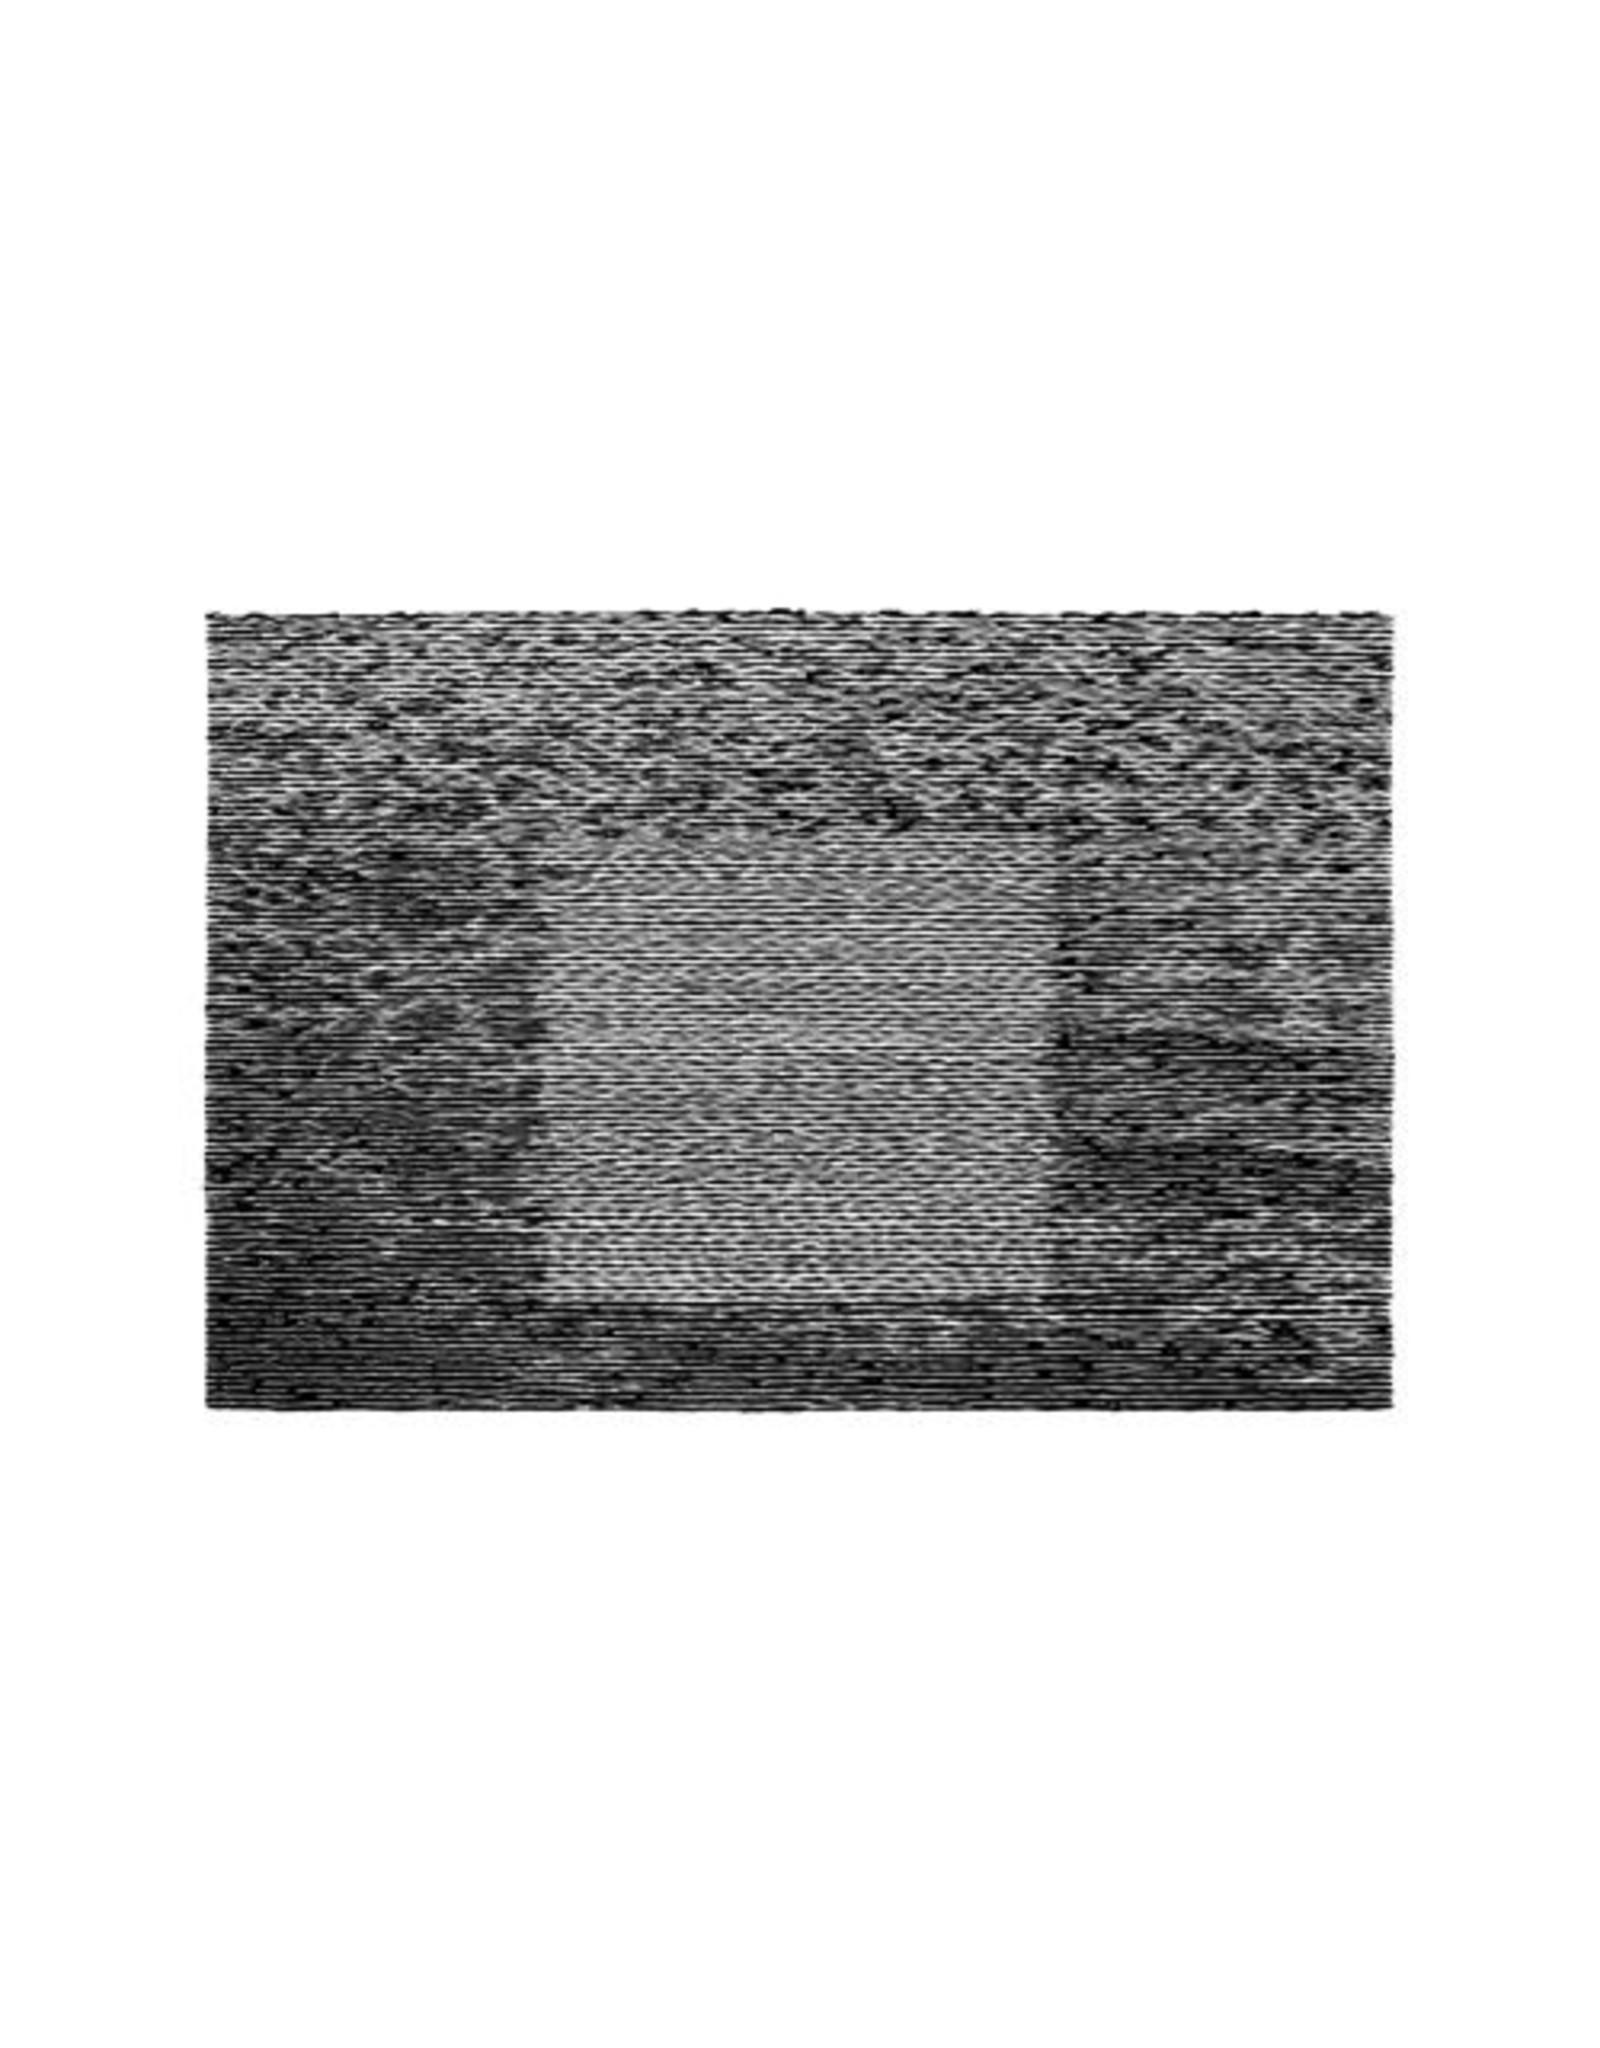 Kranky Grouper: Grid Of Points LP